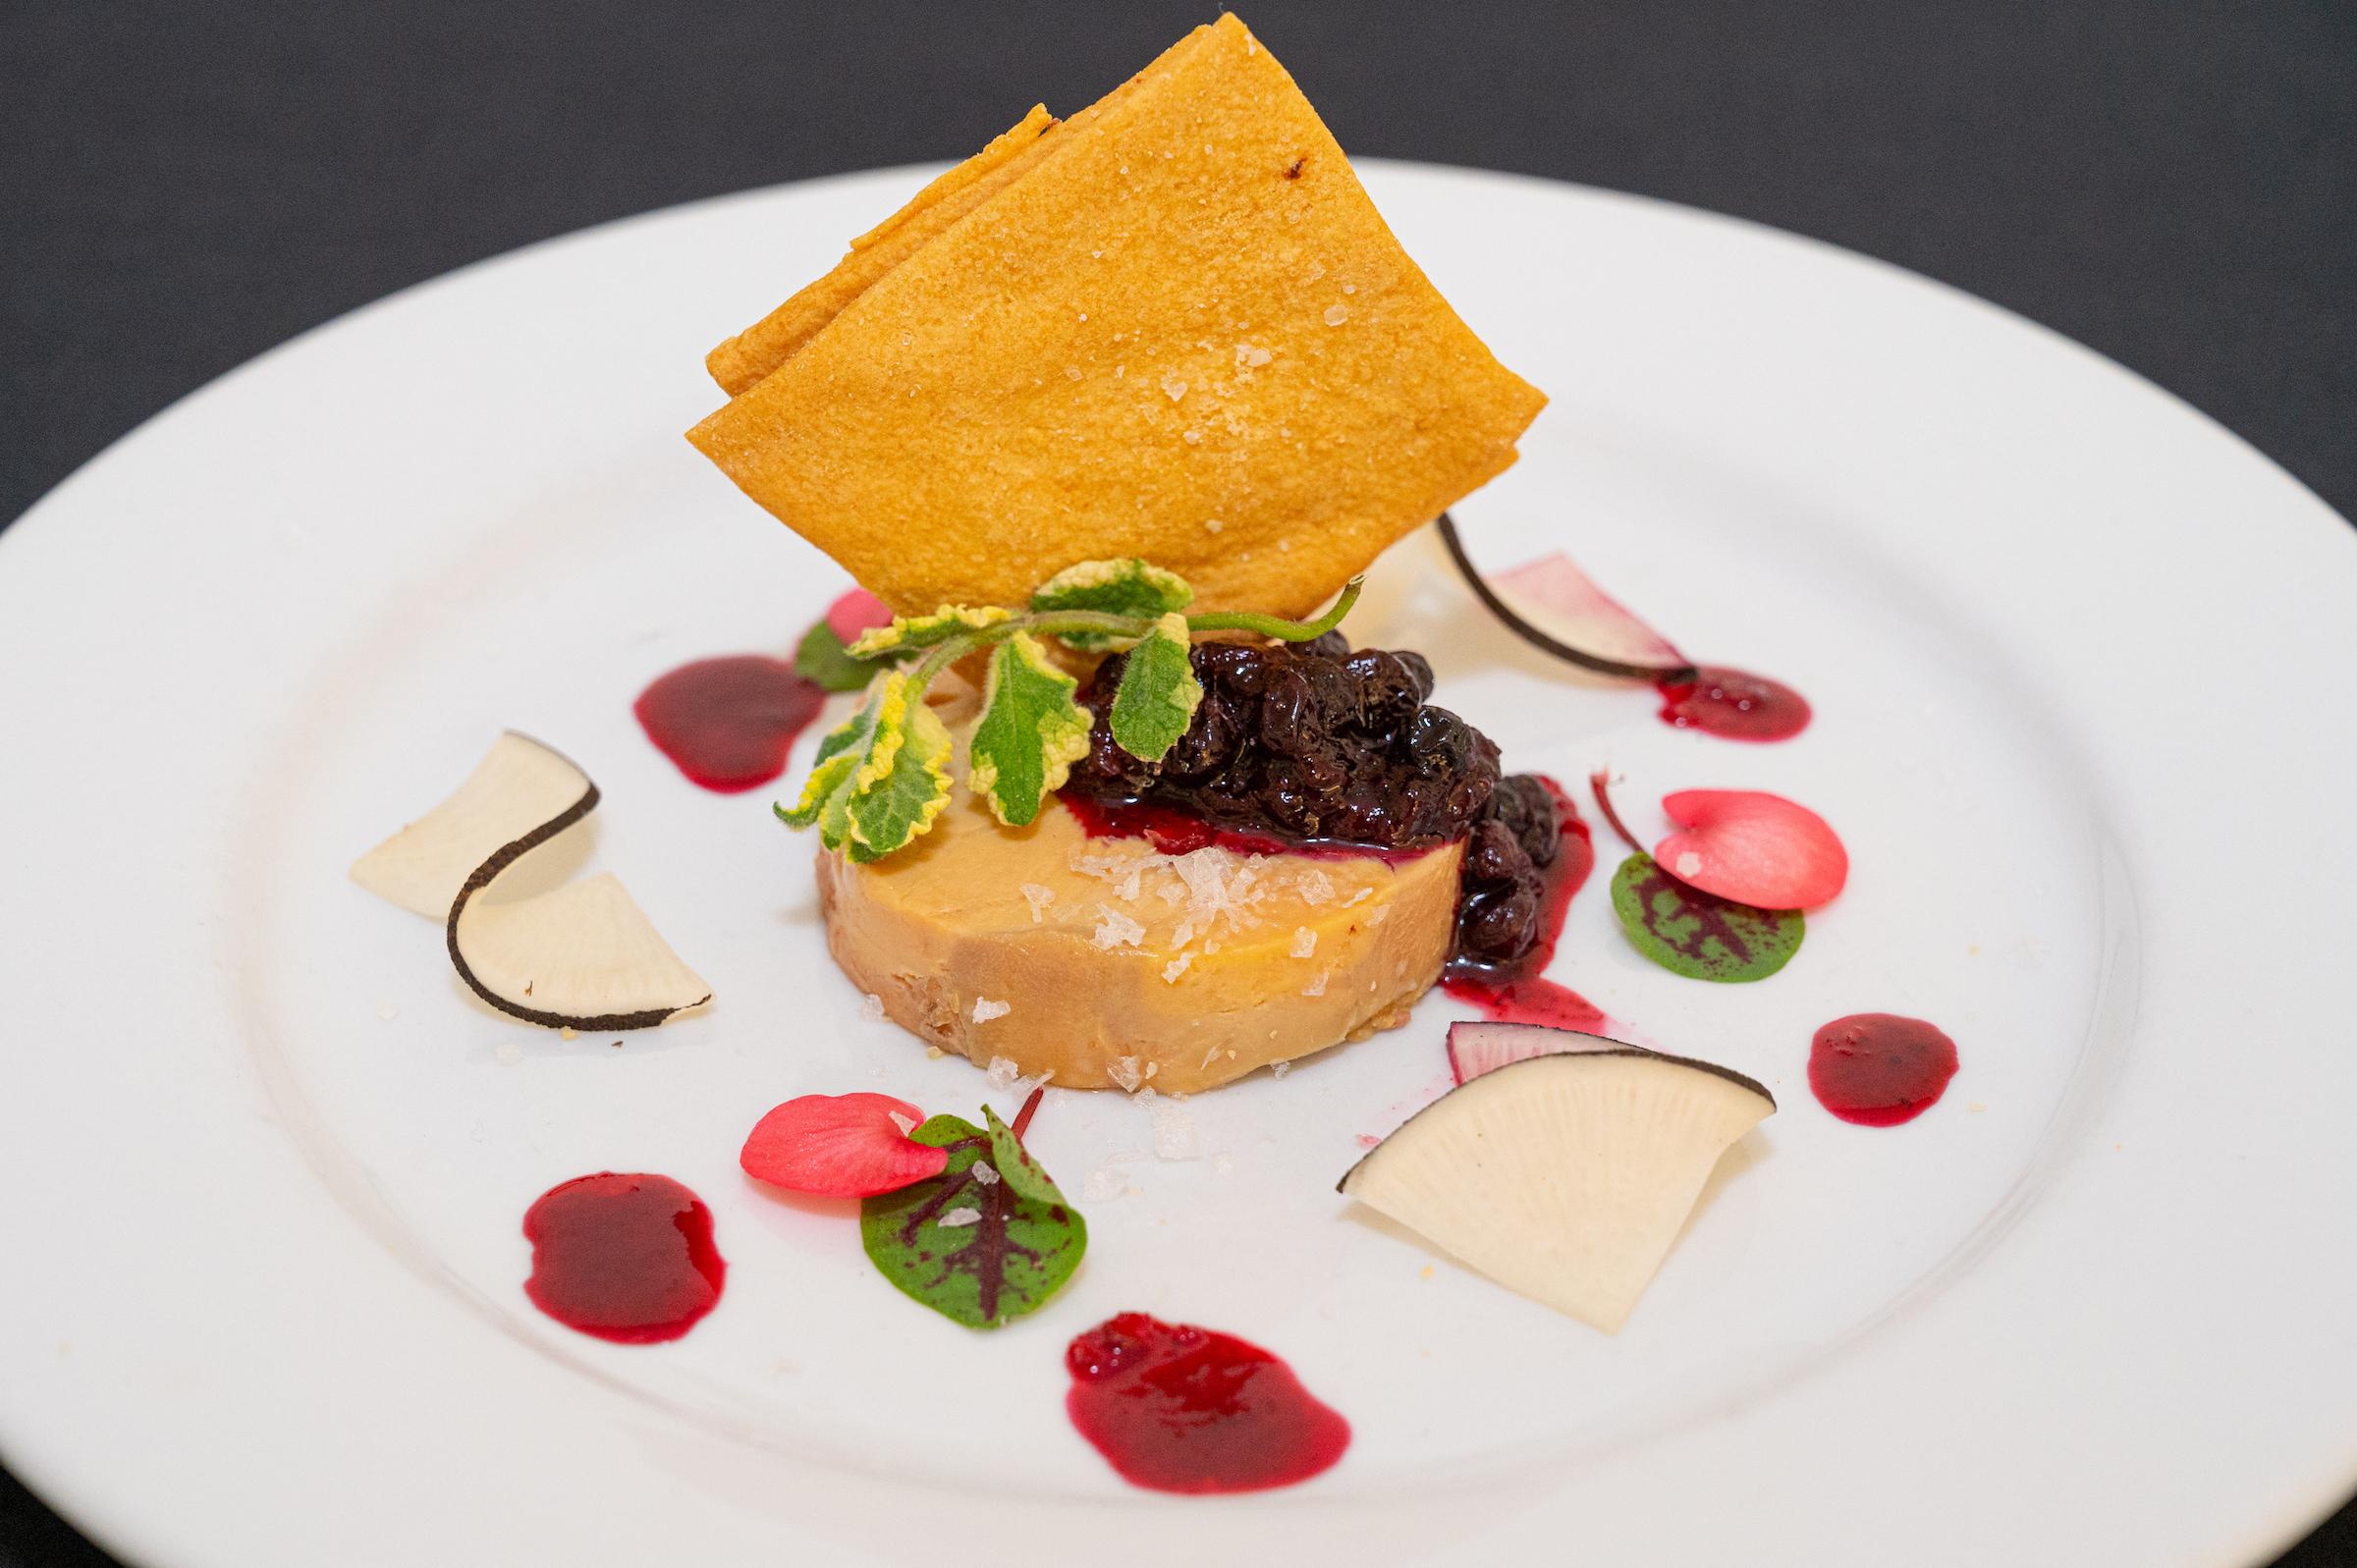 Fois Gras torchon with huckleberry jam, pickled black radish, and sea salt cracker